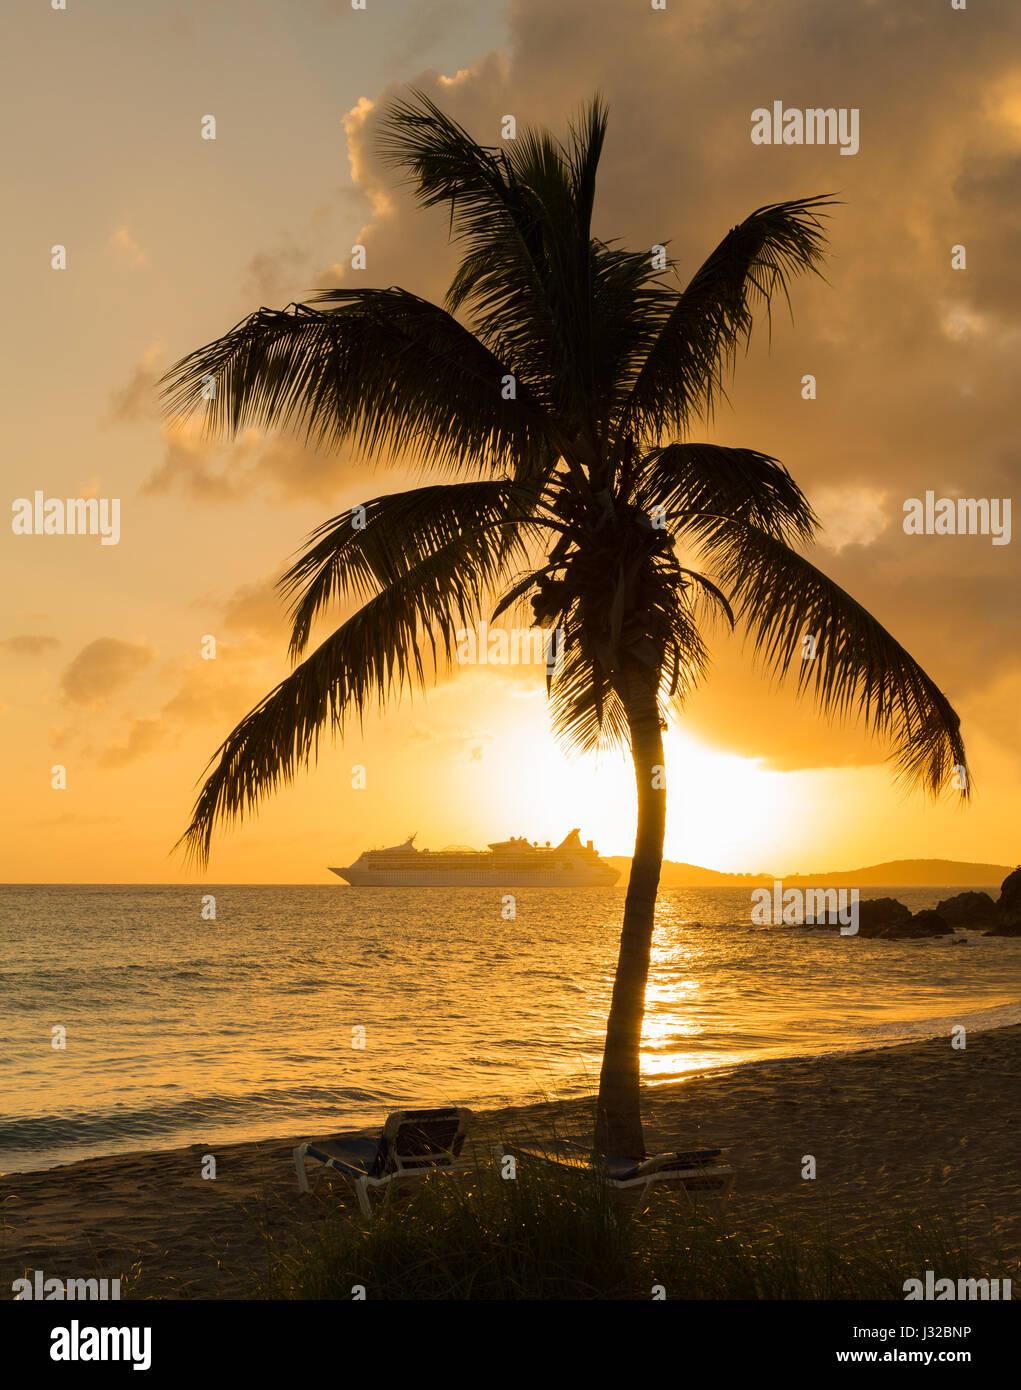 Palm tree at sunset, Frenchmans bay, St Thomas, US Virgin Islands, Caribbean with cruise ship on horizon Stock Photo